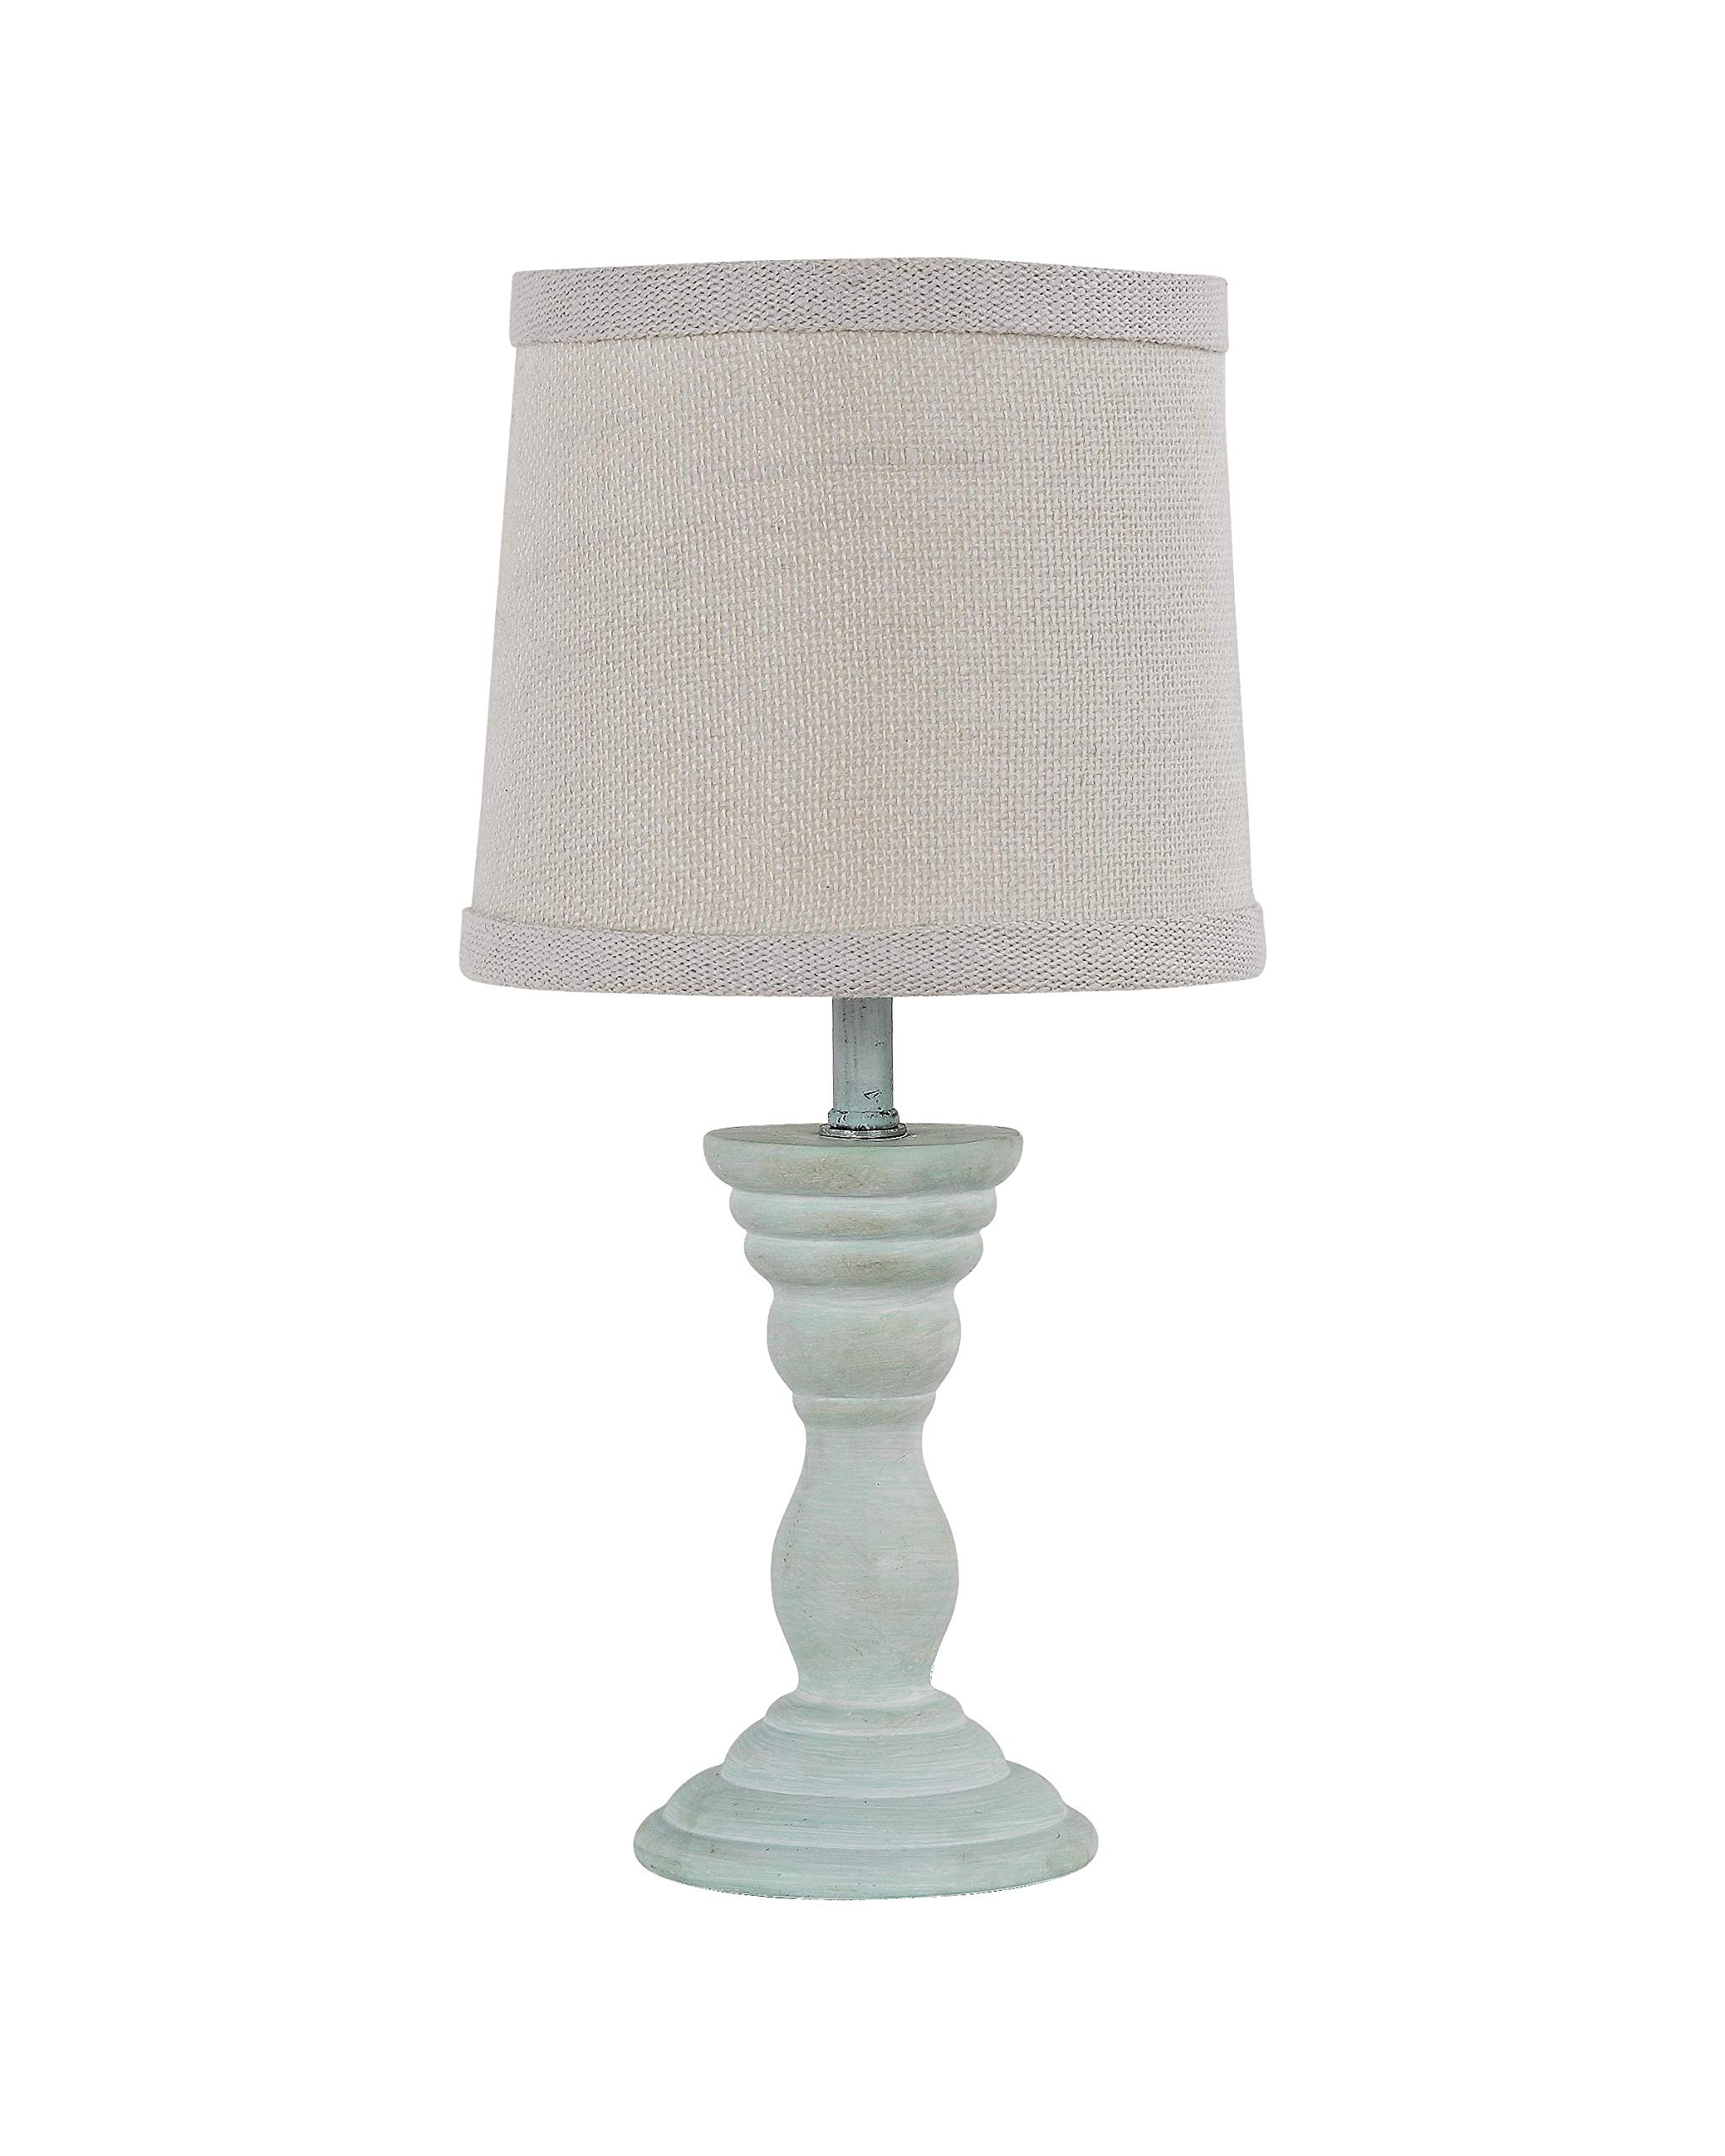 AHS Lighting L2158BL-UP1 Randolph Spa Blue Accent Lamp, 7'' x 7'' x 12''